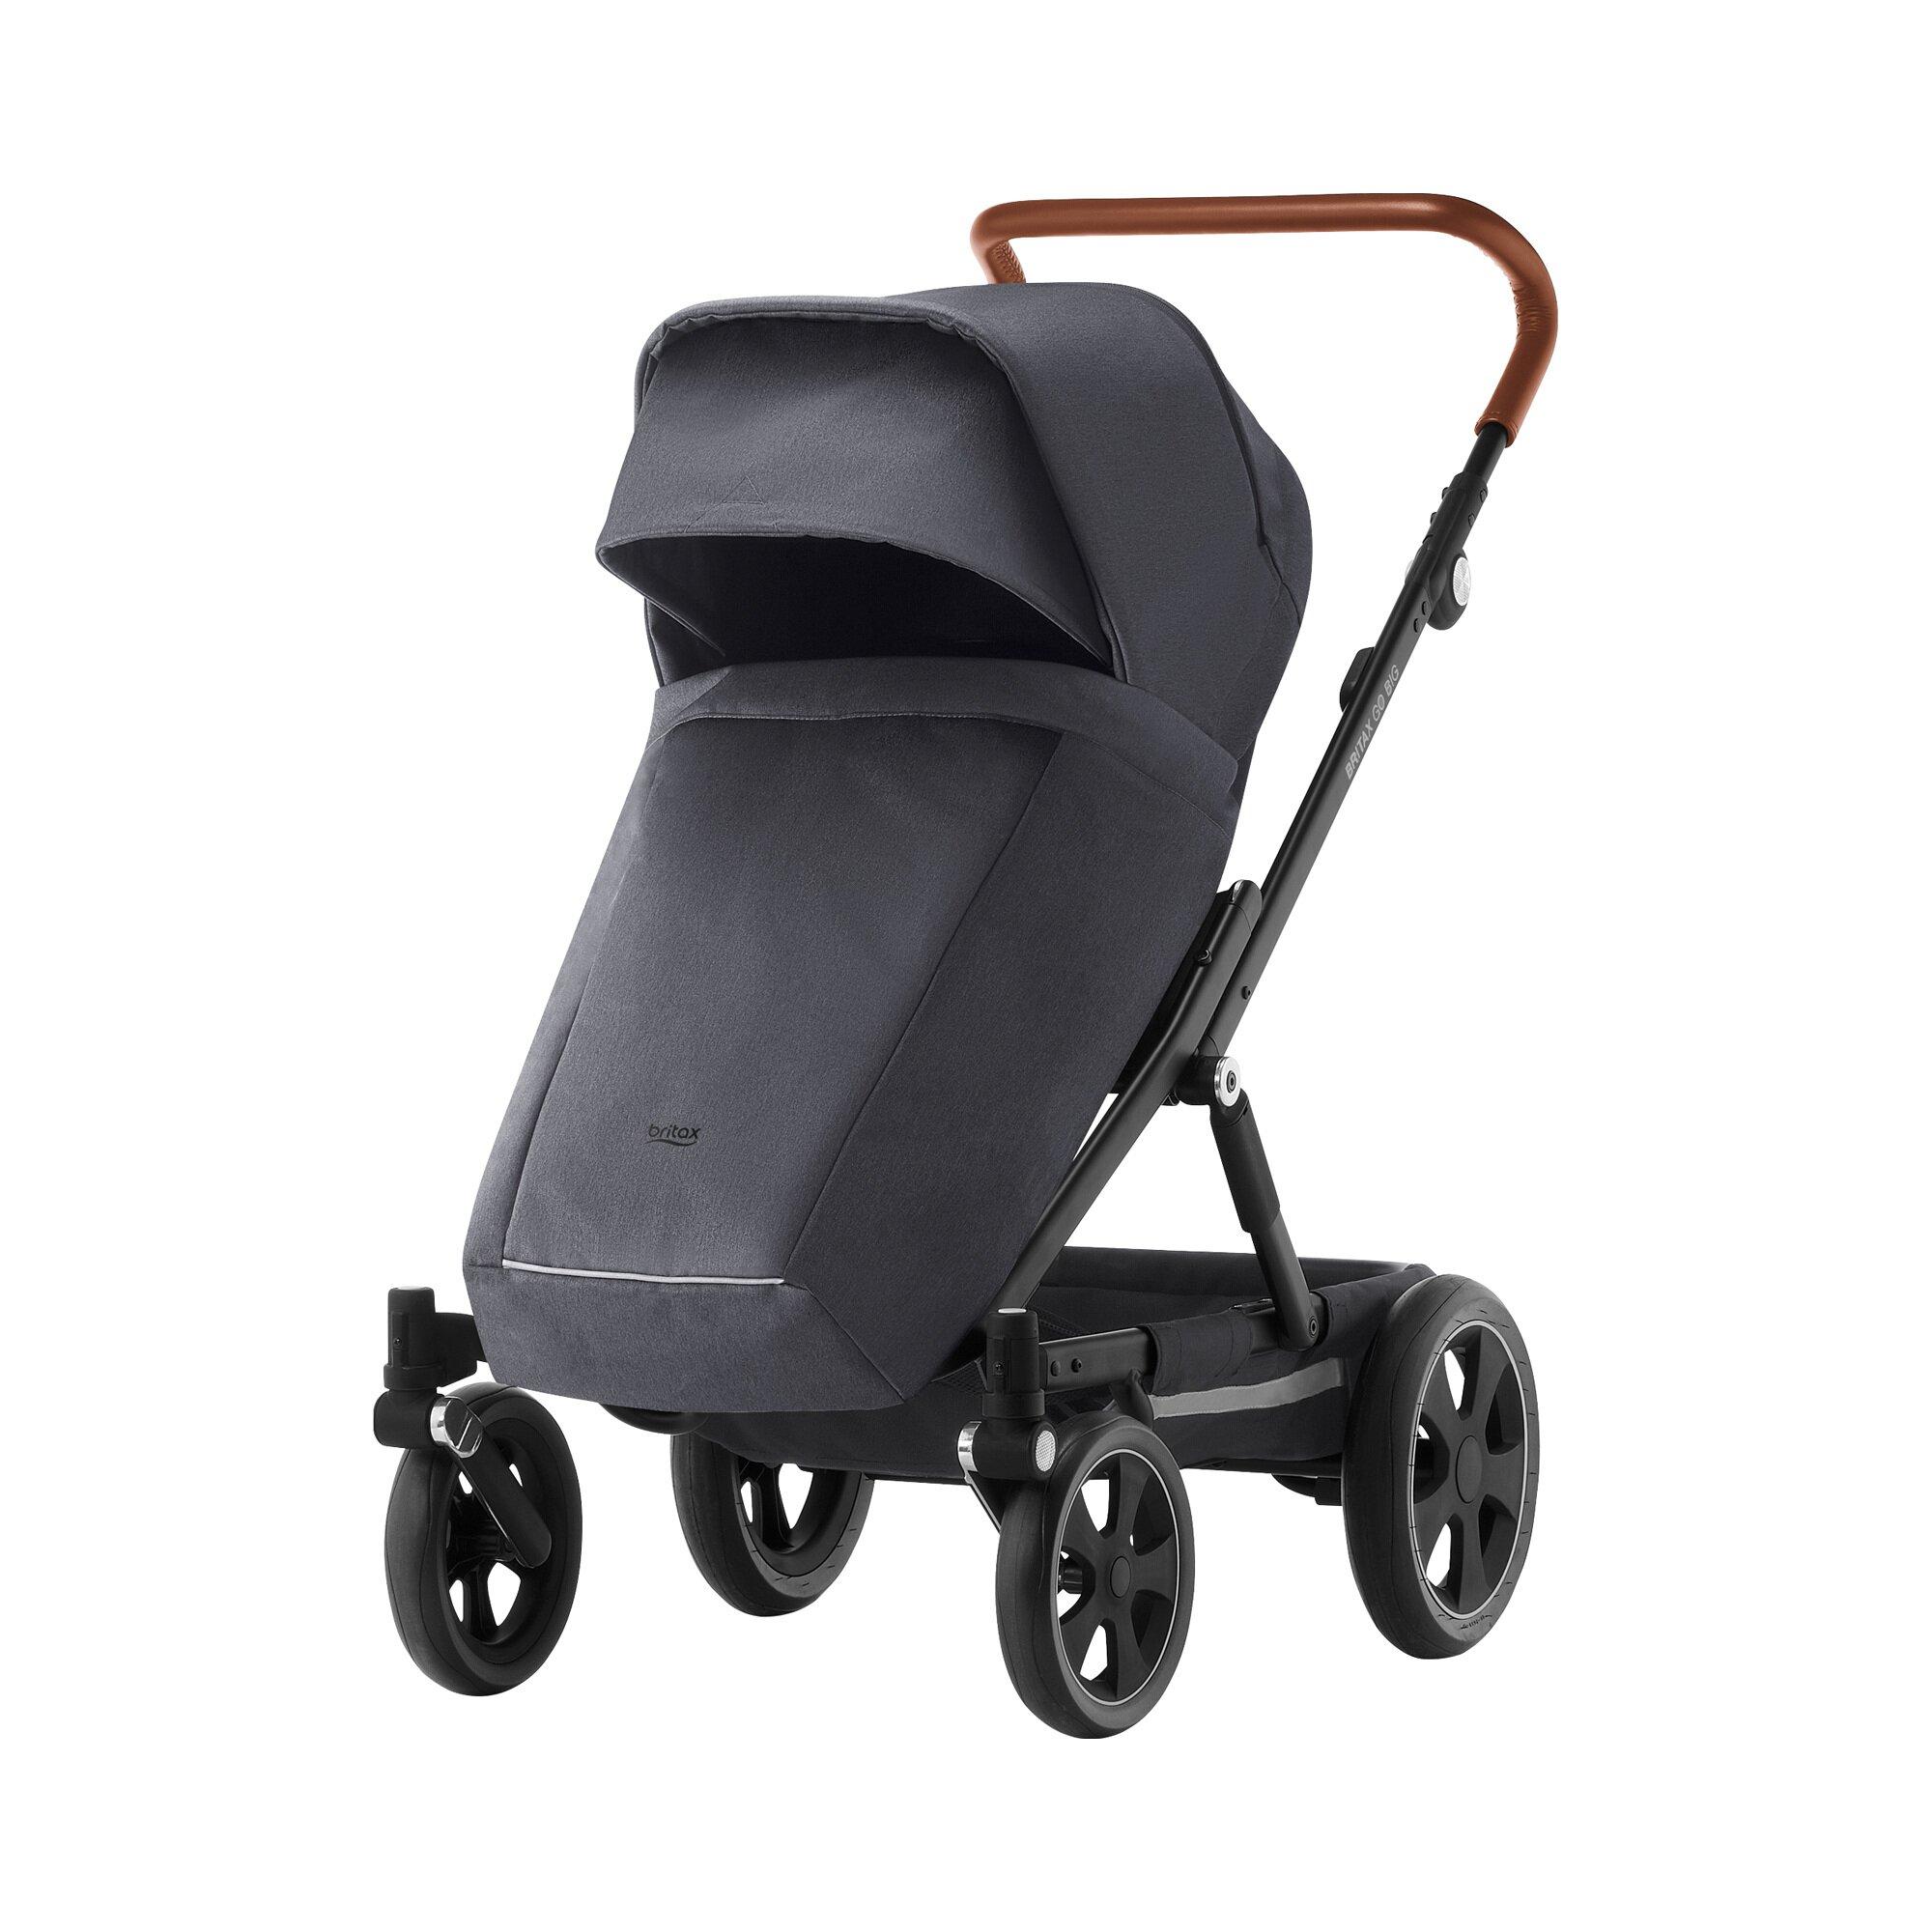 premium-go-big-kinderwagen-schwarz